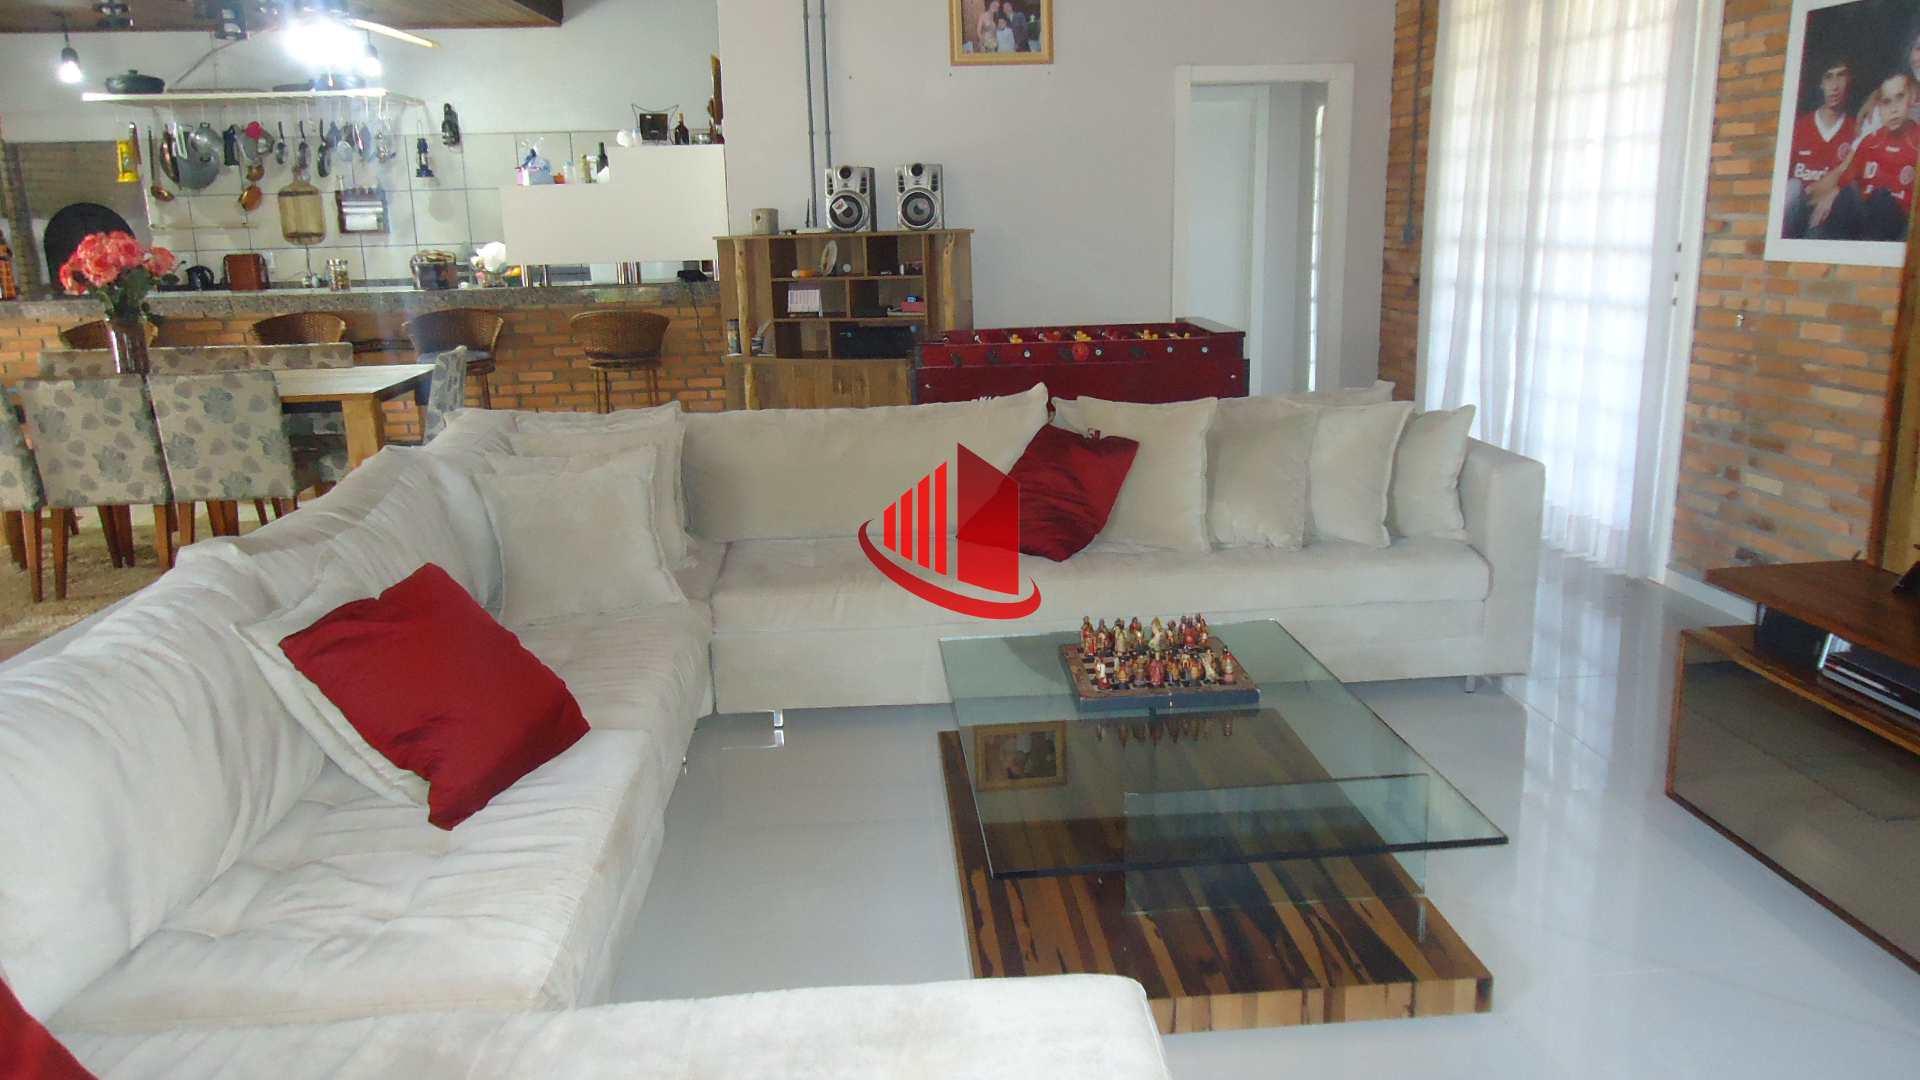 Casa com 3 dorms, Centro (Marechal Bormann), Chapecó - R$ 2.5 mi, Cod: 714